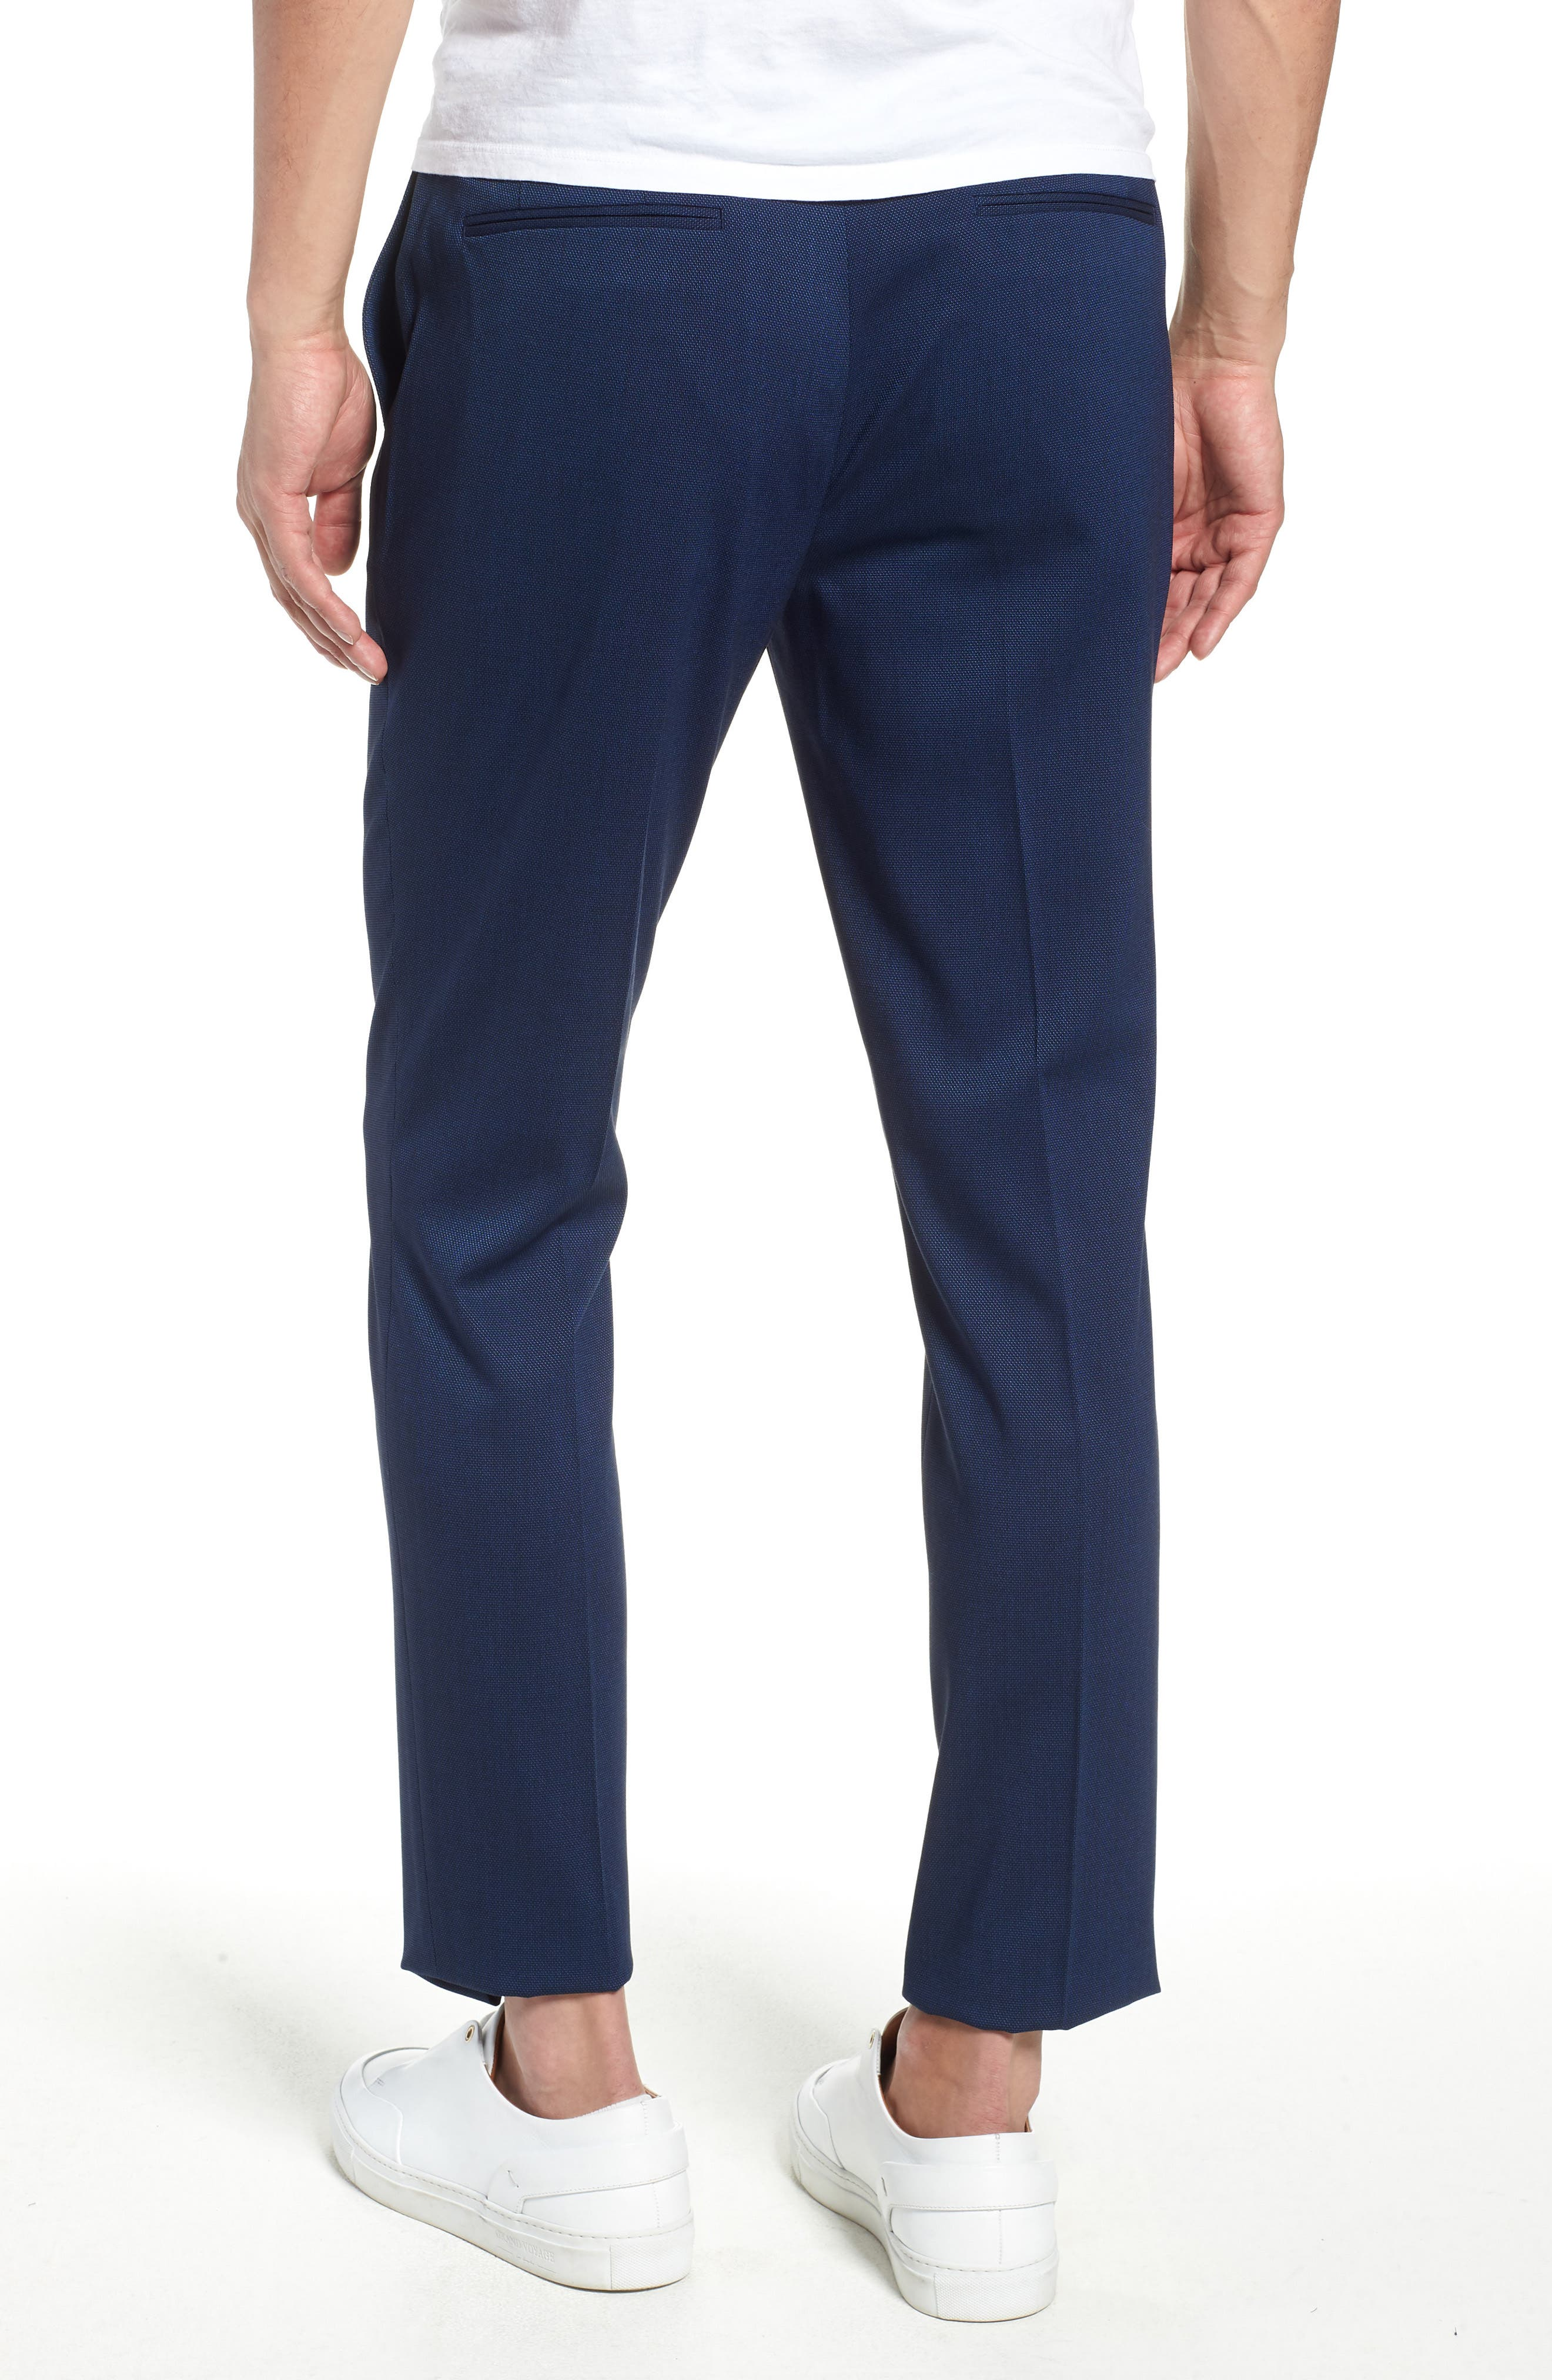 TOPMAN, Skinny Fit Suit Pants, Alternate thumbnail 2, color, MID BLUE